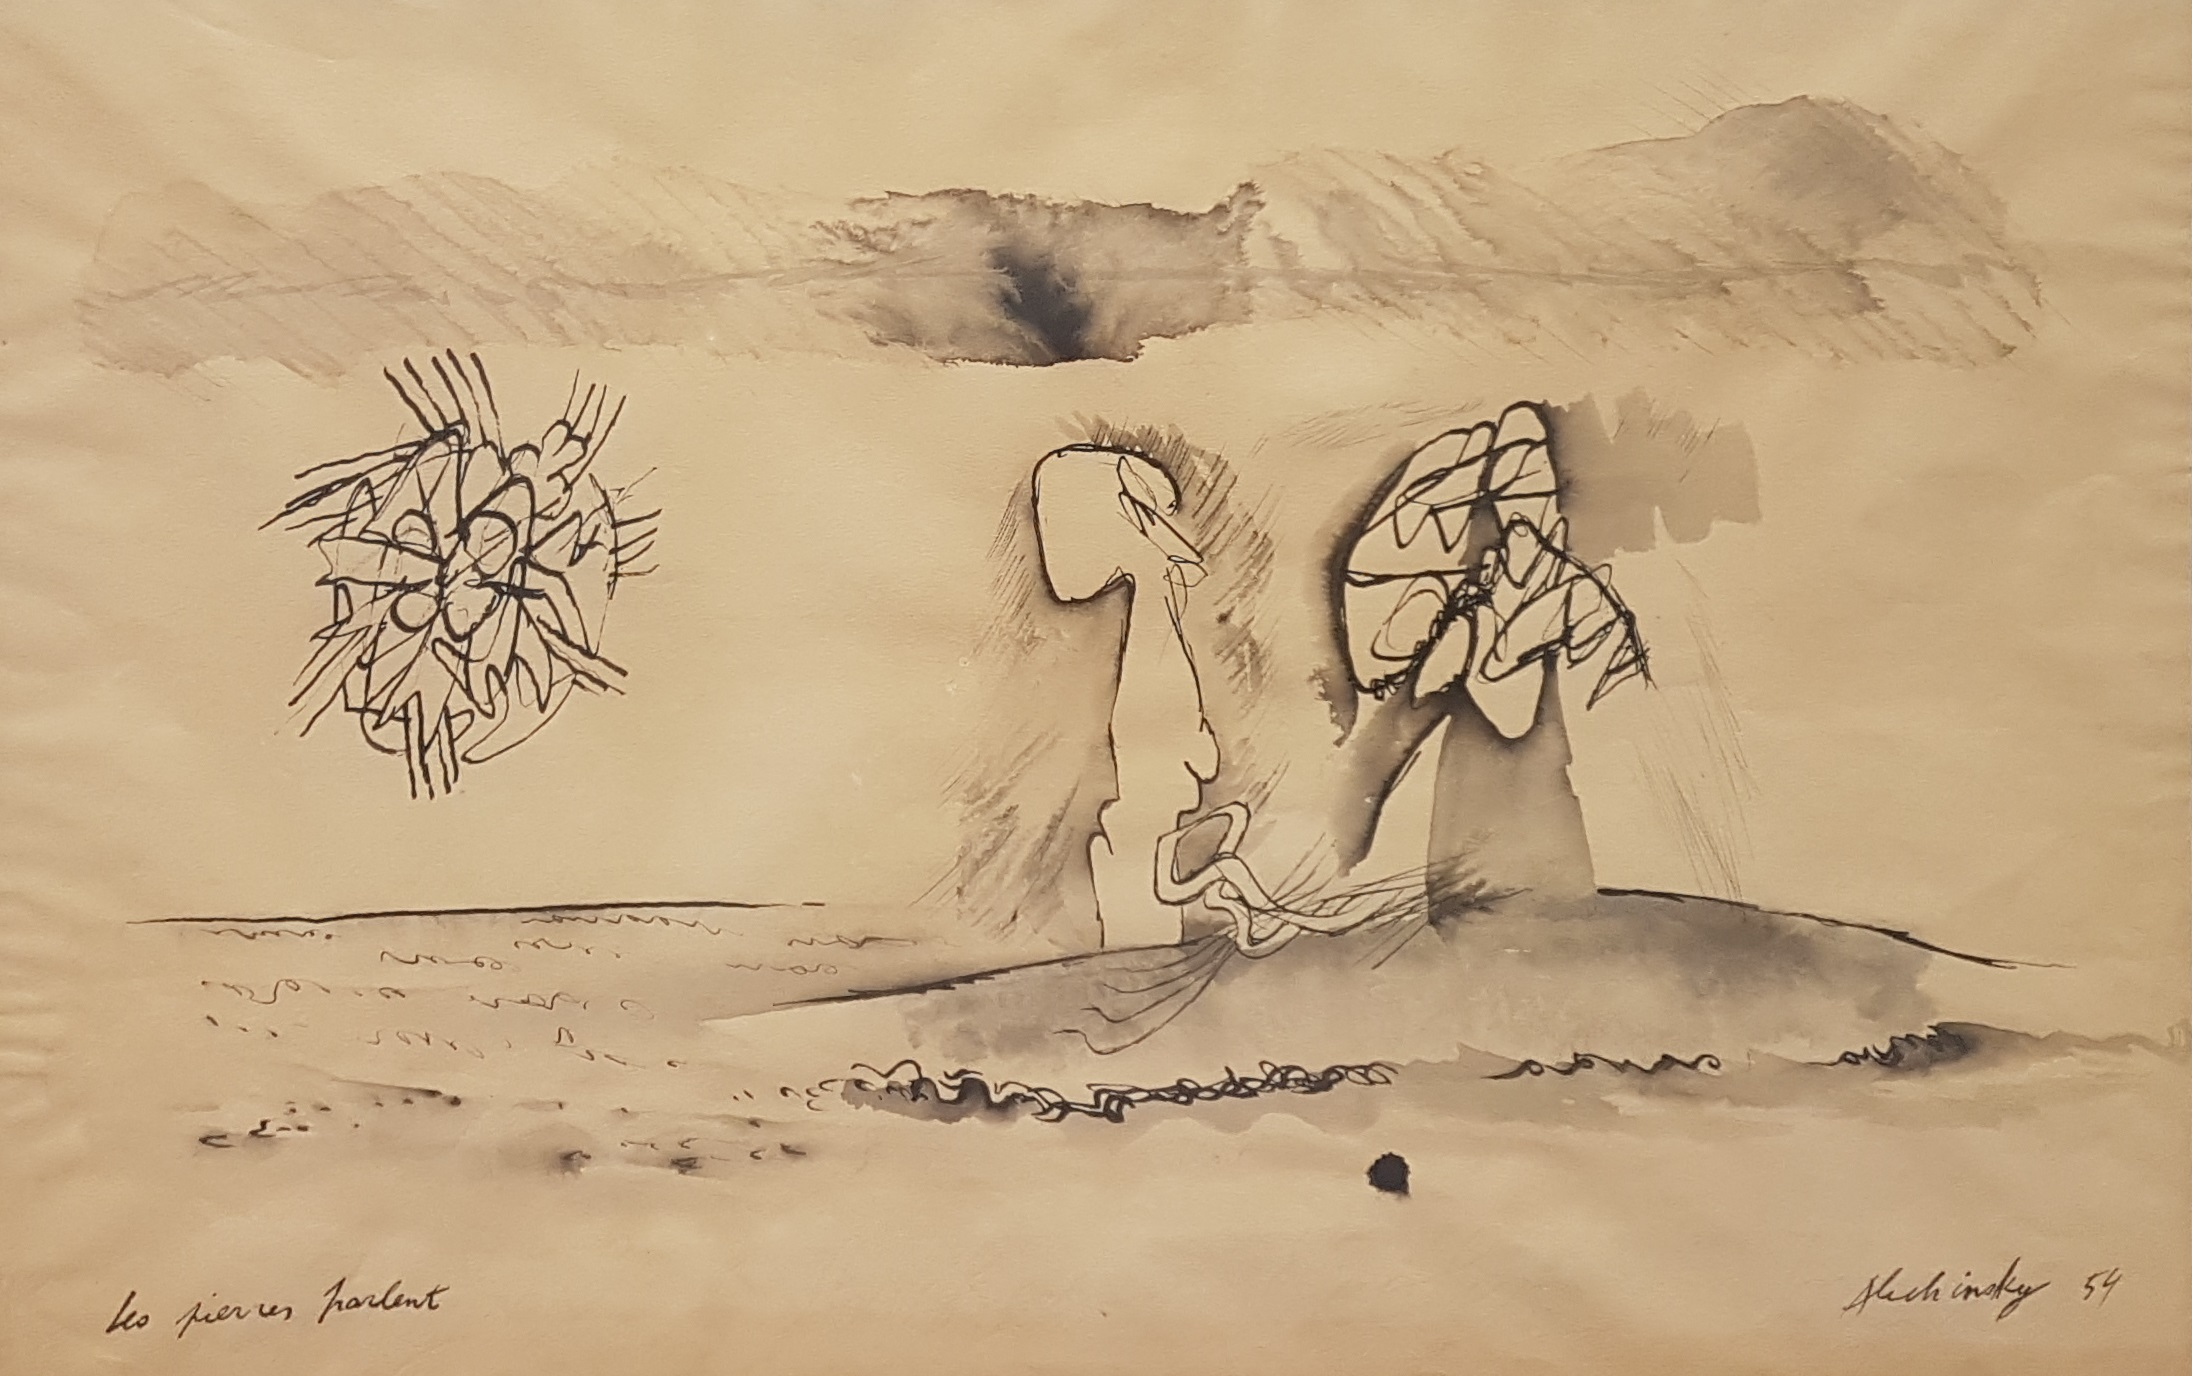 Les pierres parlent / De stenen spreken